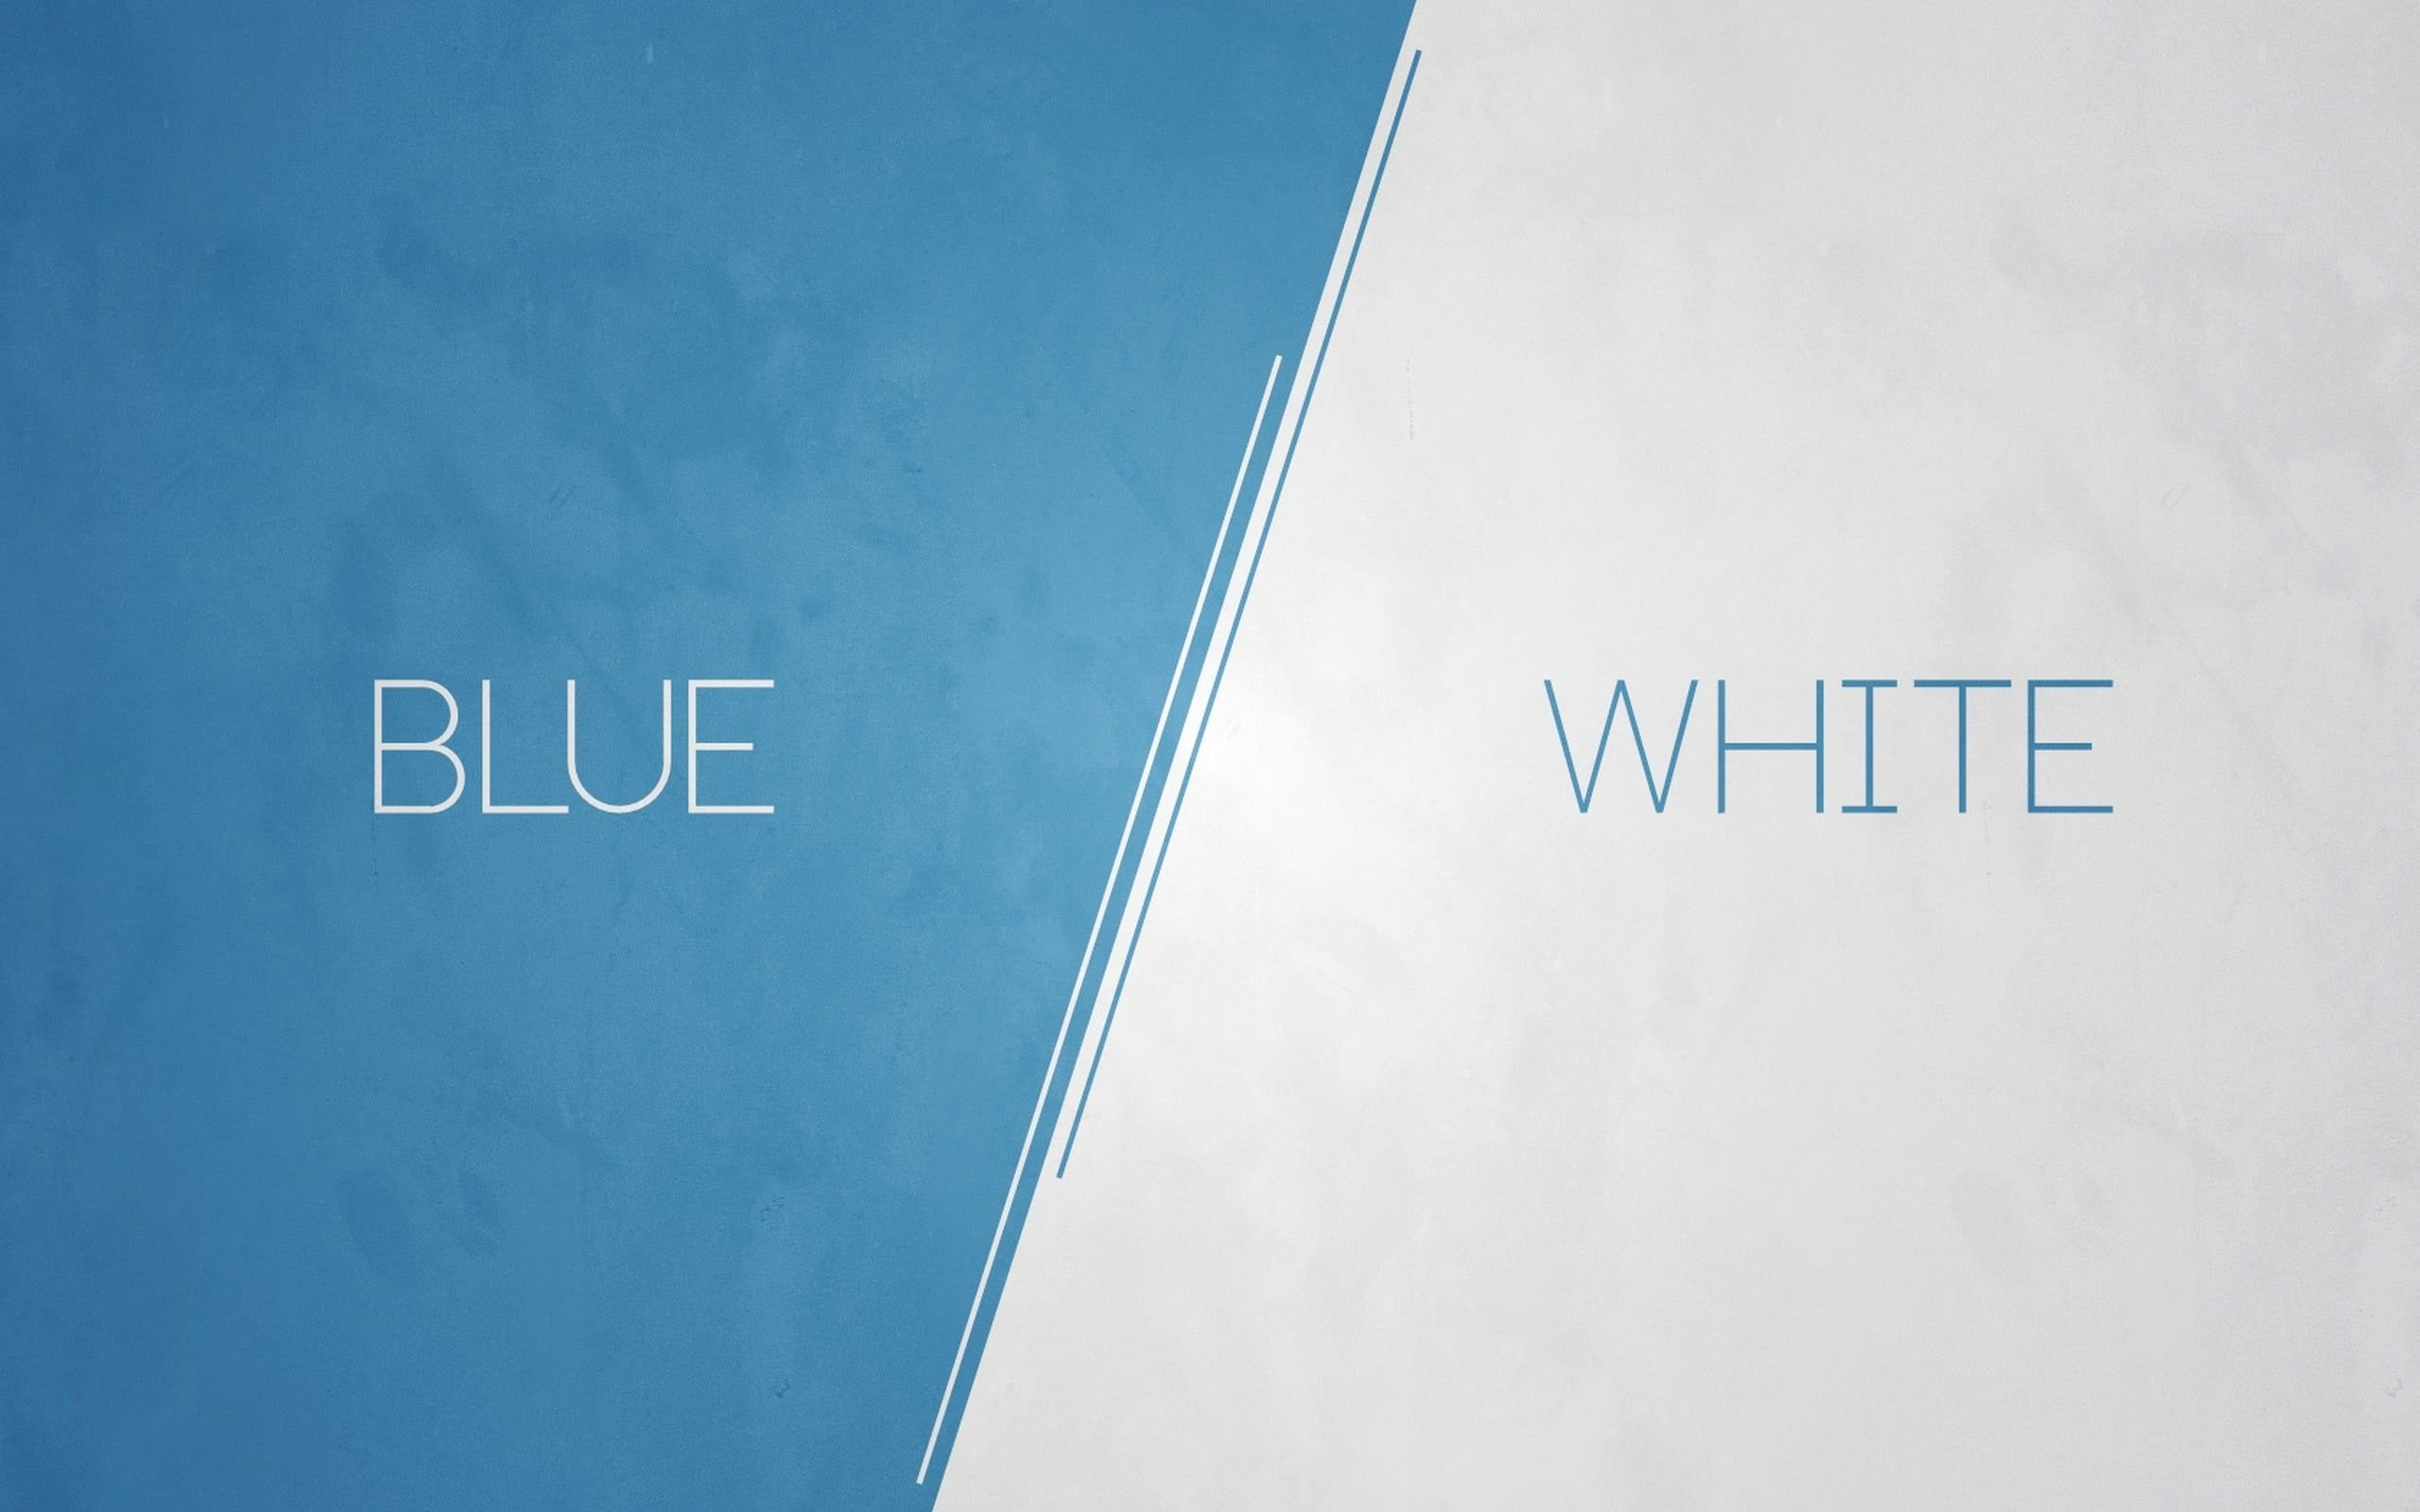 White And Blue Logo Abstract Modern Vintage Minimalism Blue White Digital Art 2k Wallpaper Hdw Blue And White Wallpaper Blue Wallpapers Blue And White